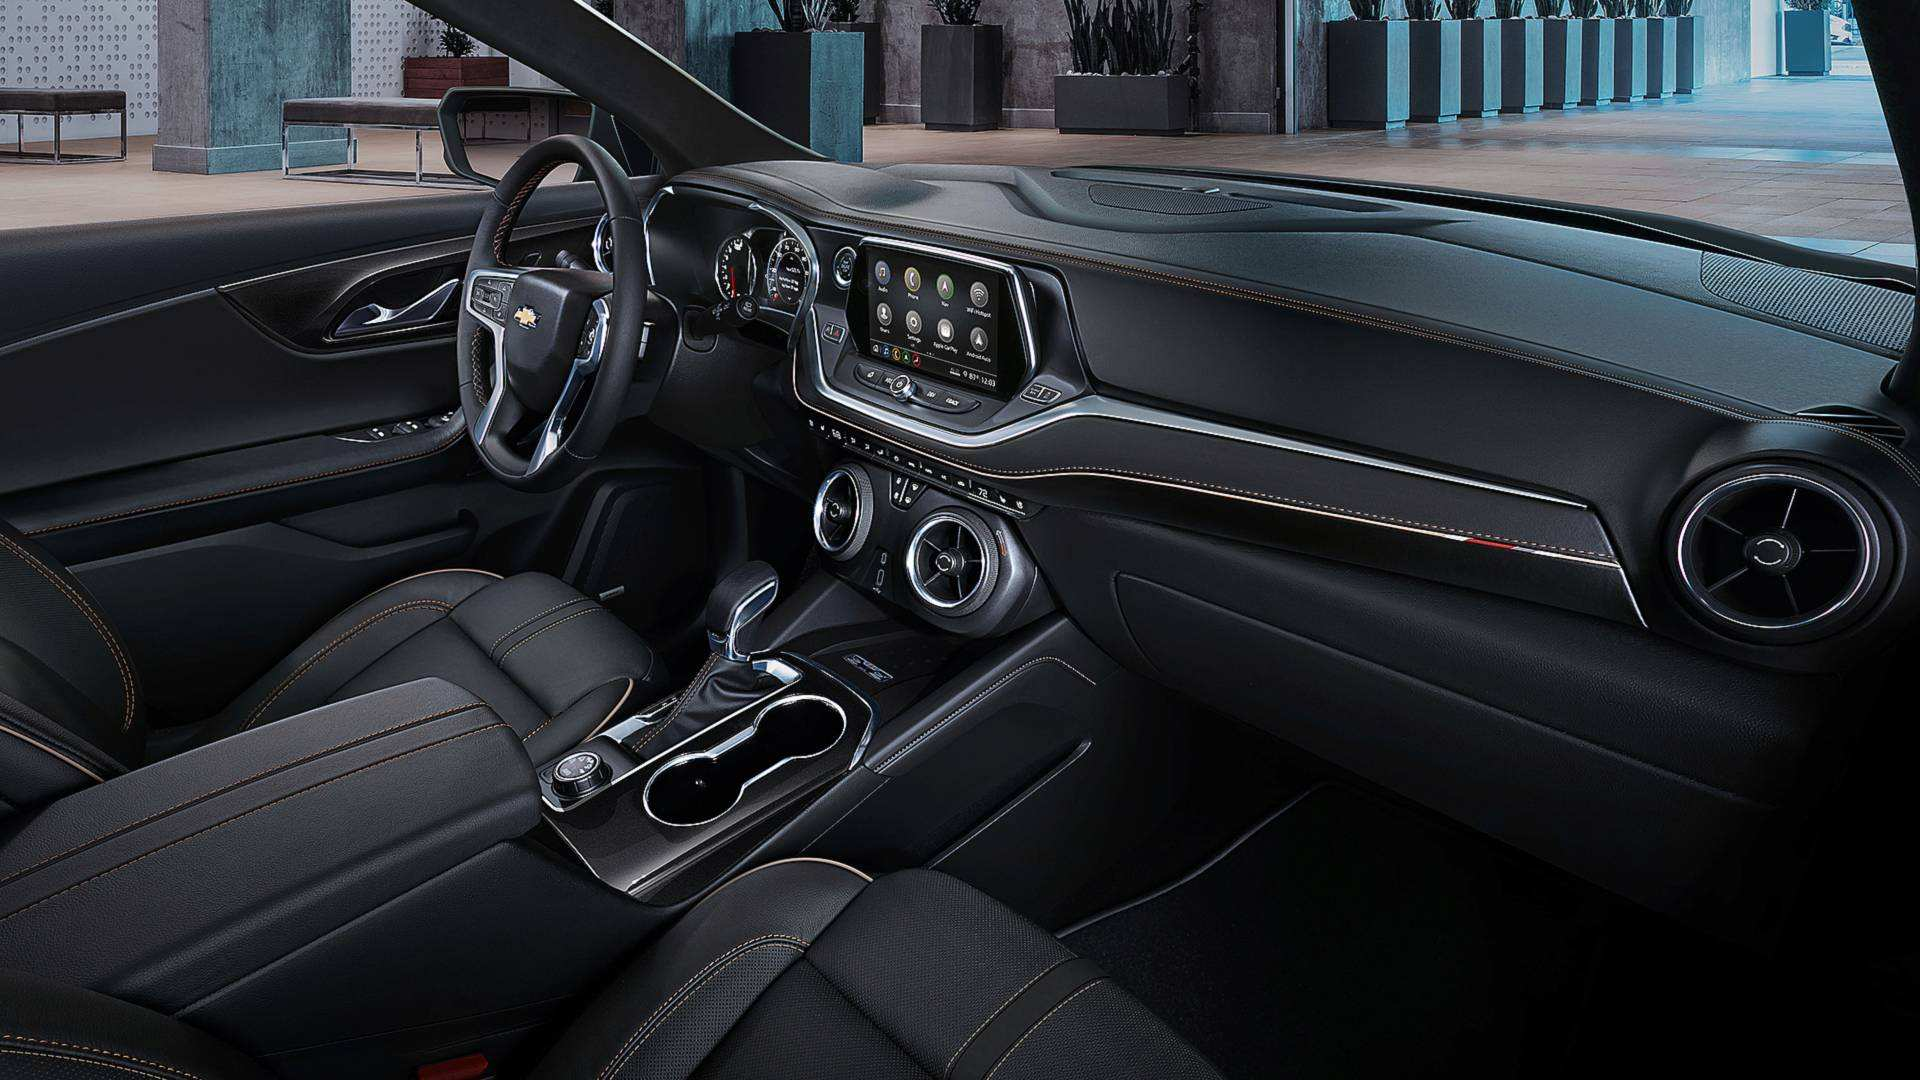 37 Great Chevrolet Trailblazer 2020 Interior Rumors by Chevrolet Trailblazer 2020 Interior